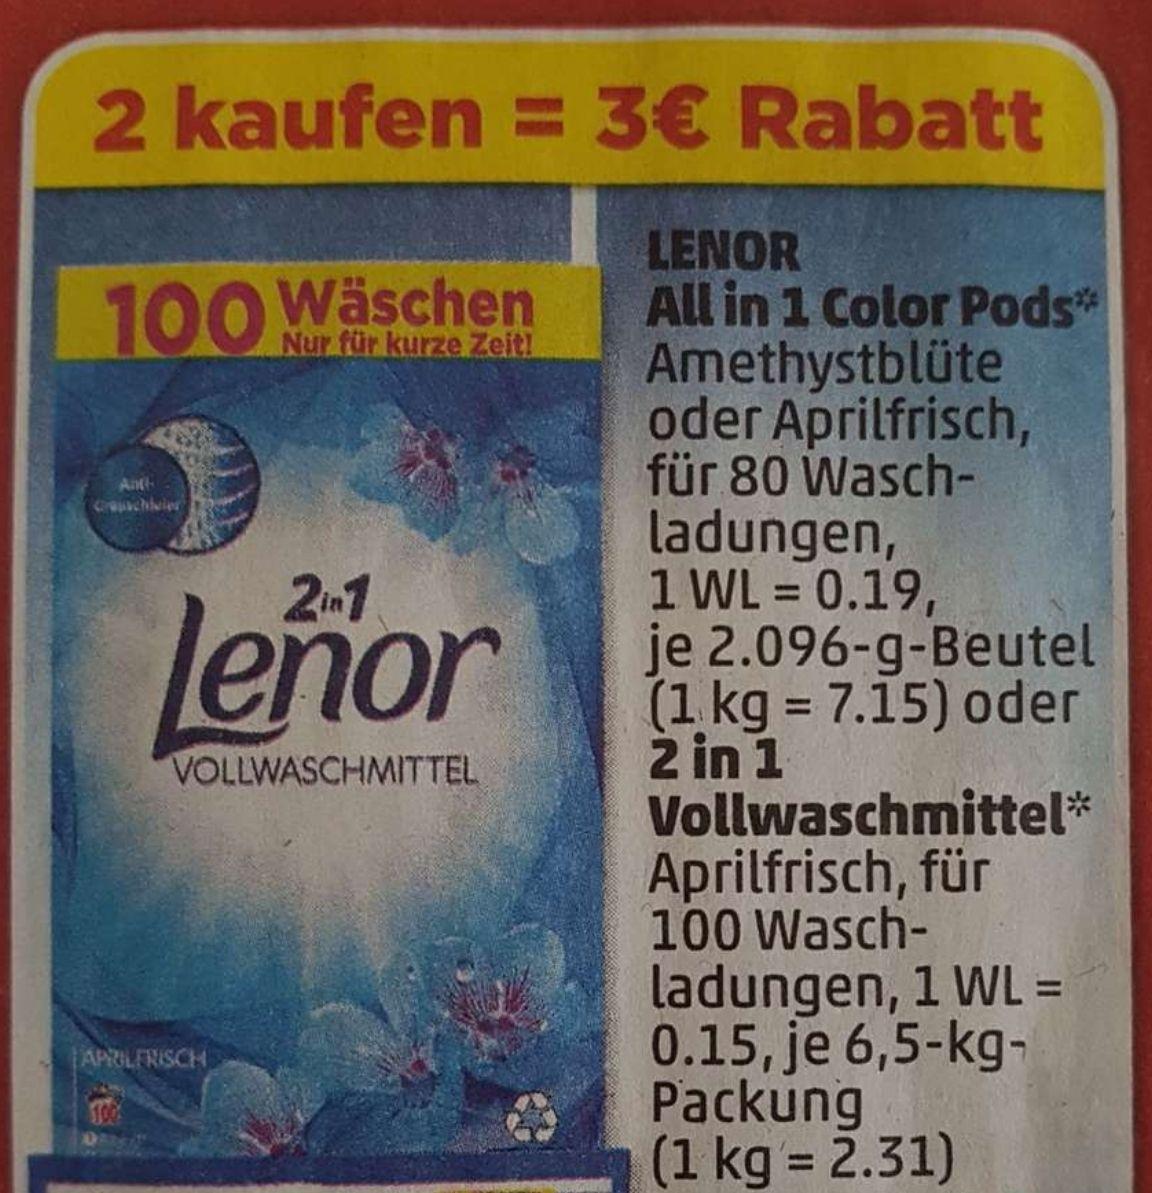 Lenor 3€ Rabatt Coupon aus dem Penny Prospekt.